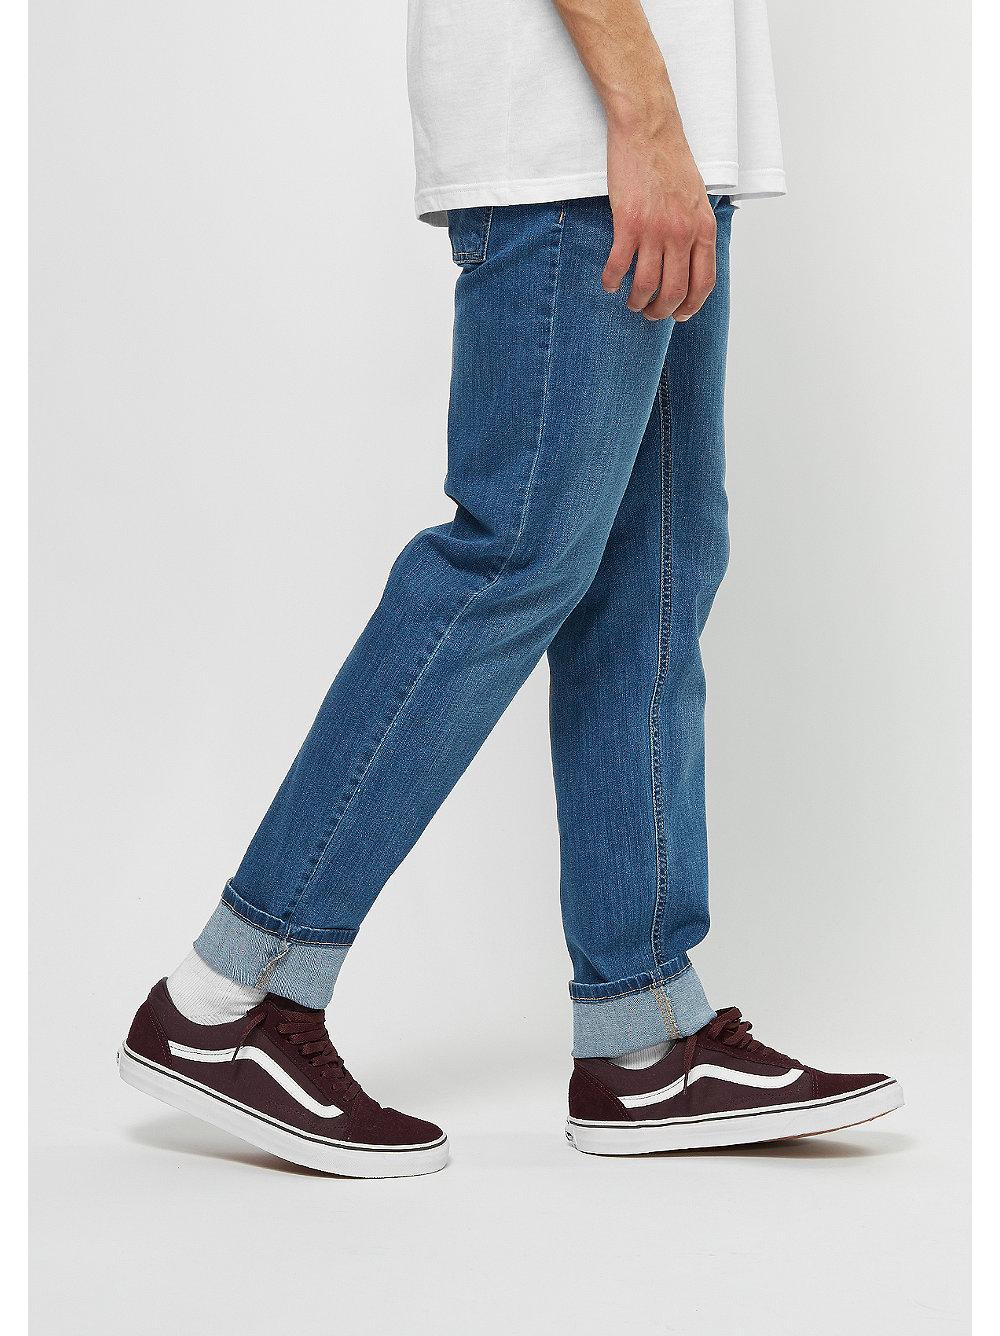 urban classics jeans hose stretch denim blue washed bei. Black Bedroom Furniture Sets. Home Design Ideas